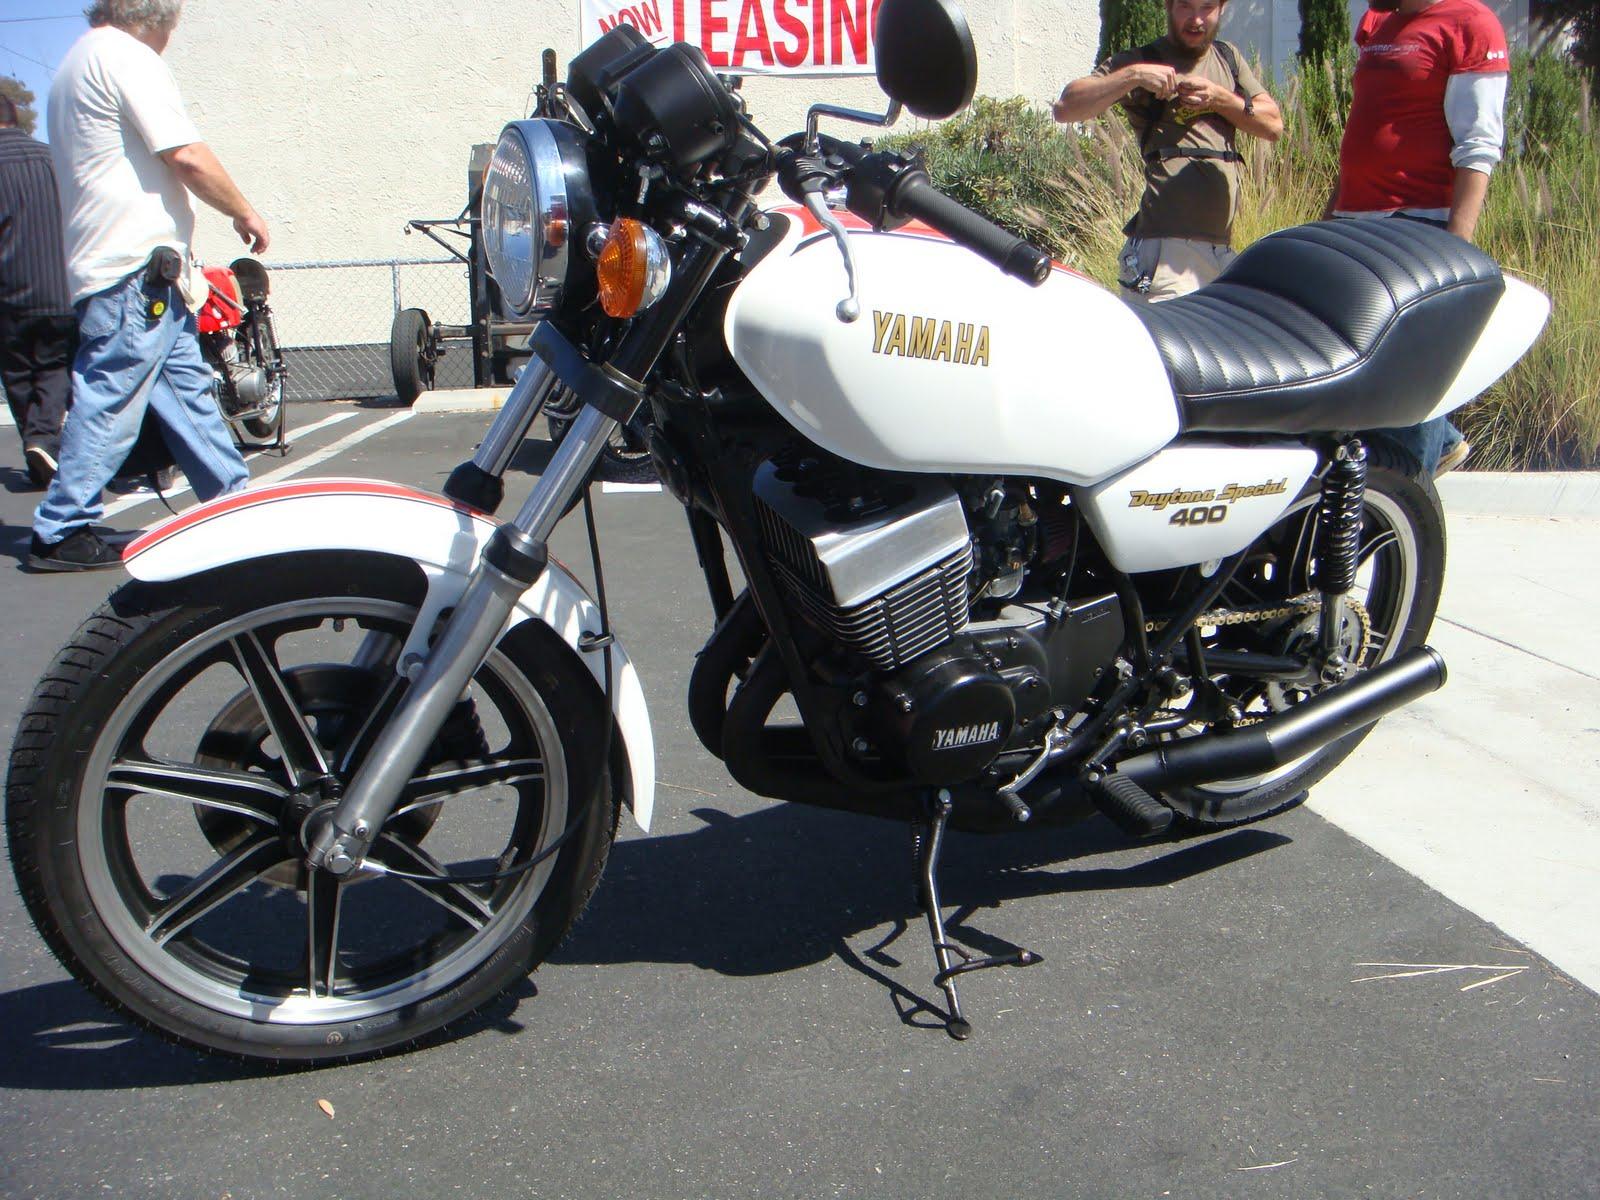 MOTOMO  1979 Yamaha RD 400 Daytona Special